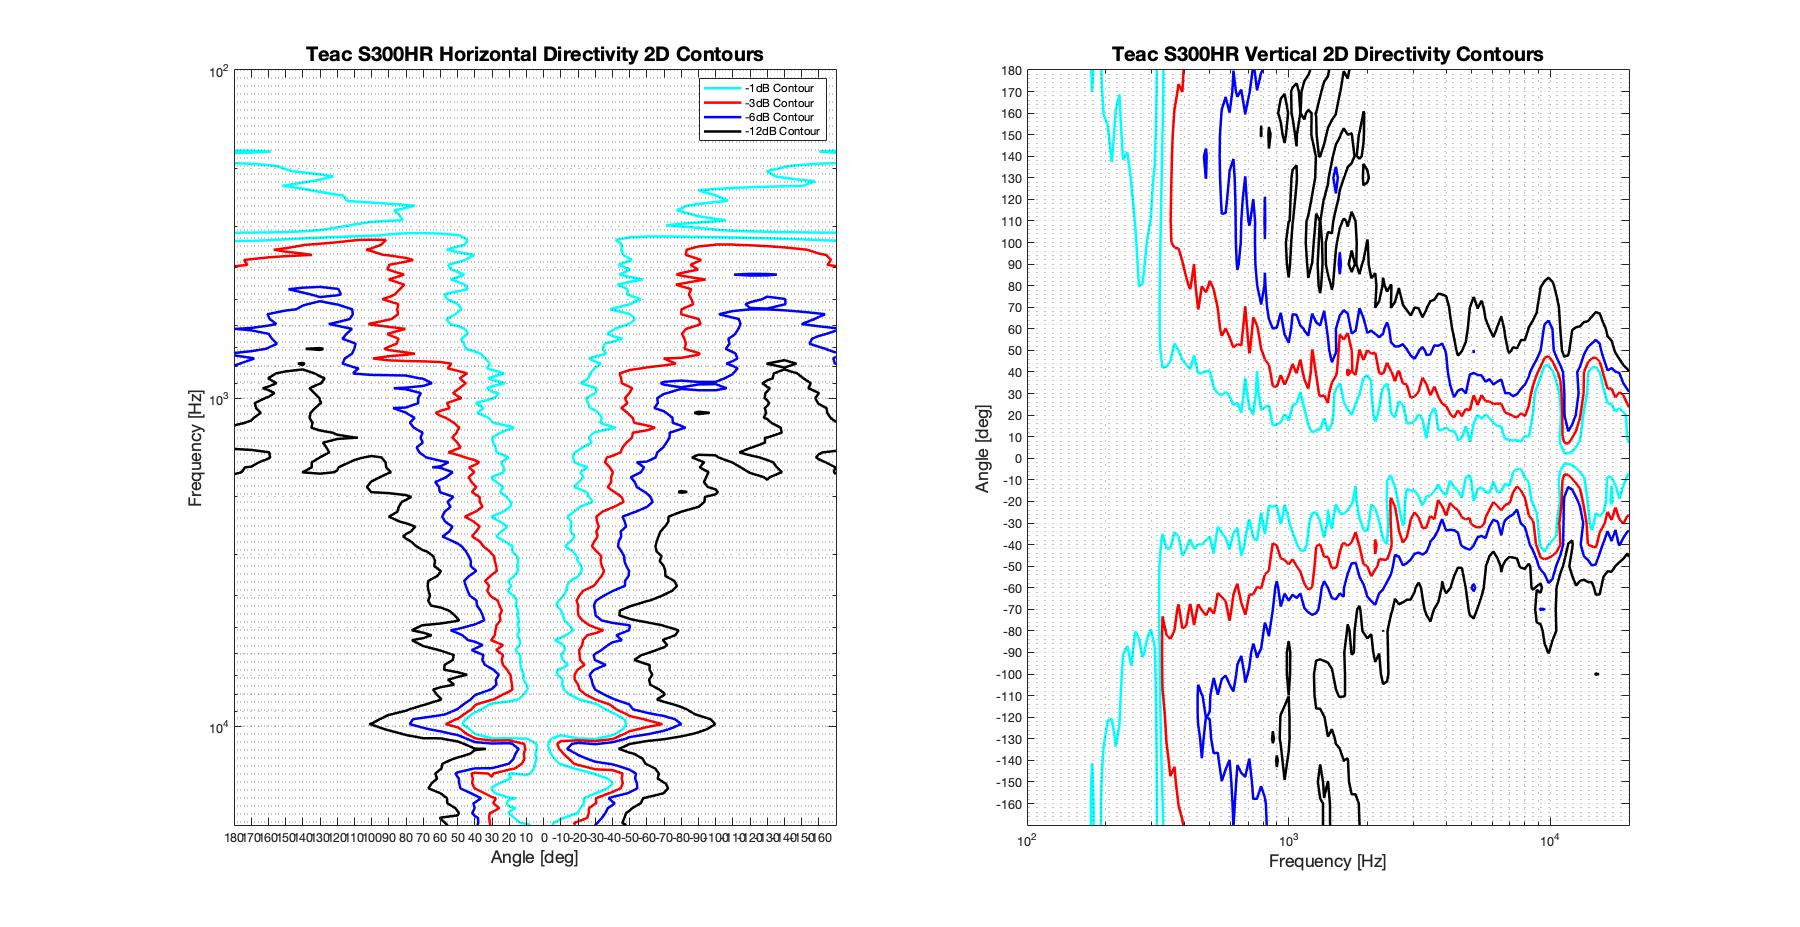 Teac S300HR 2D surface Directivity Contour Only Data.png